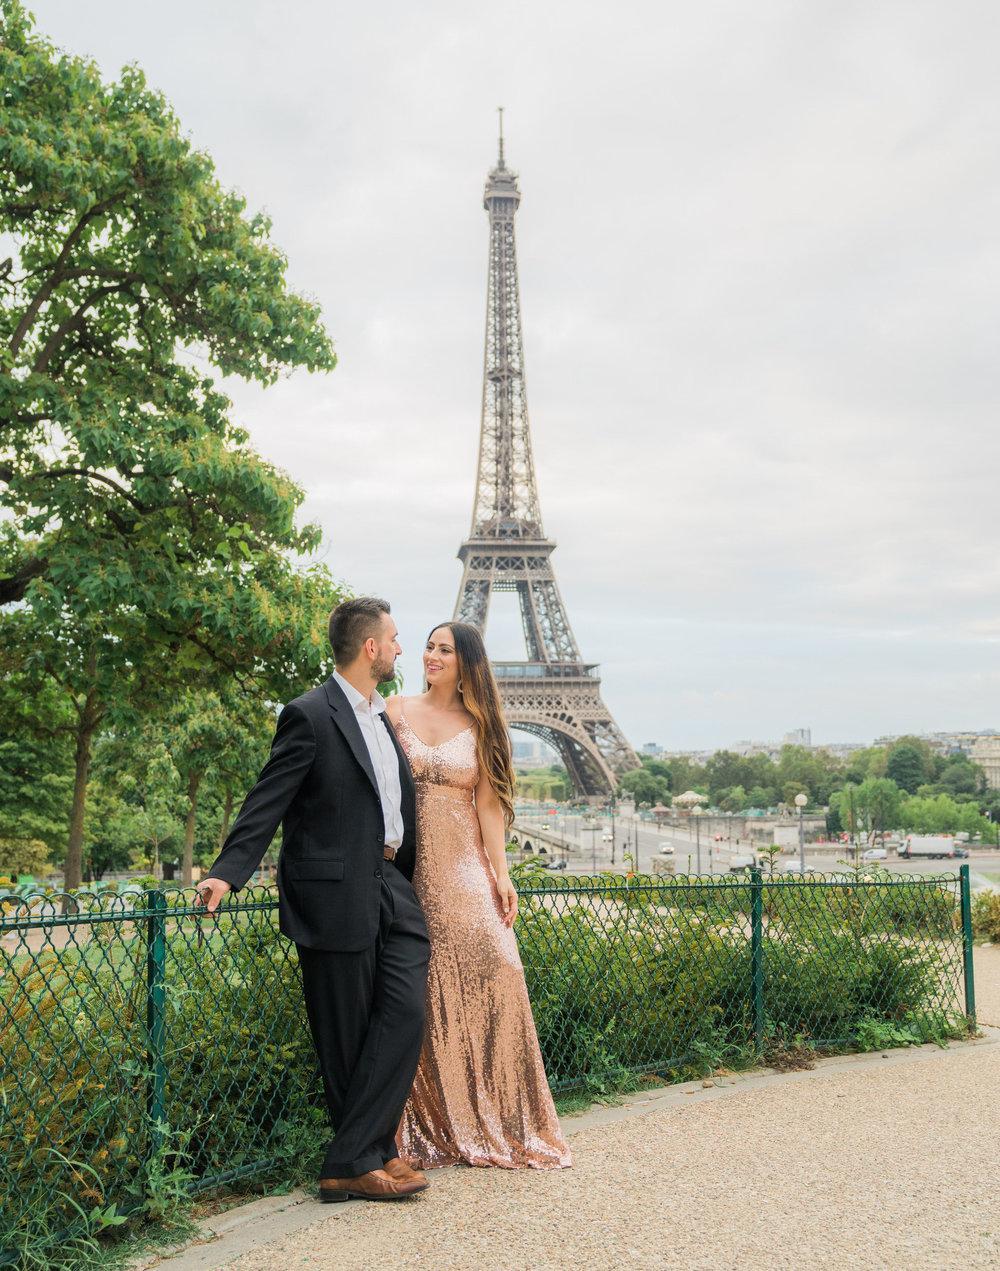 paris engagement at the eiffel tower